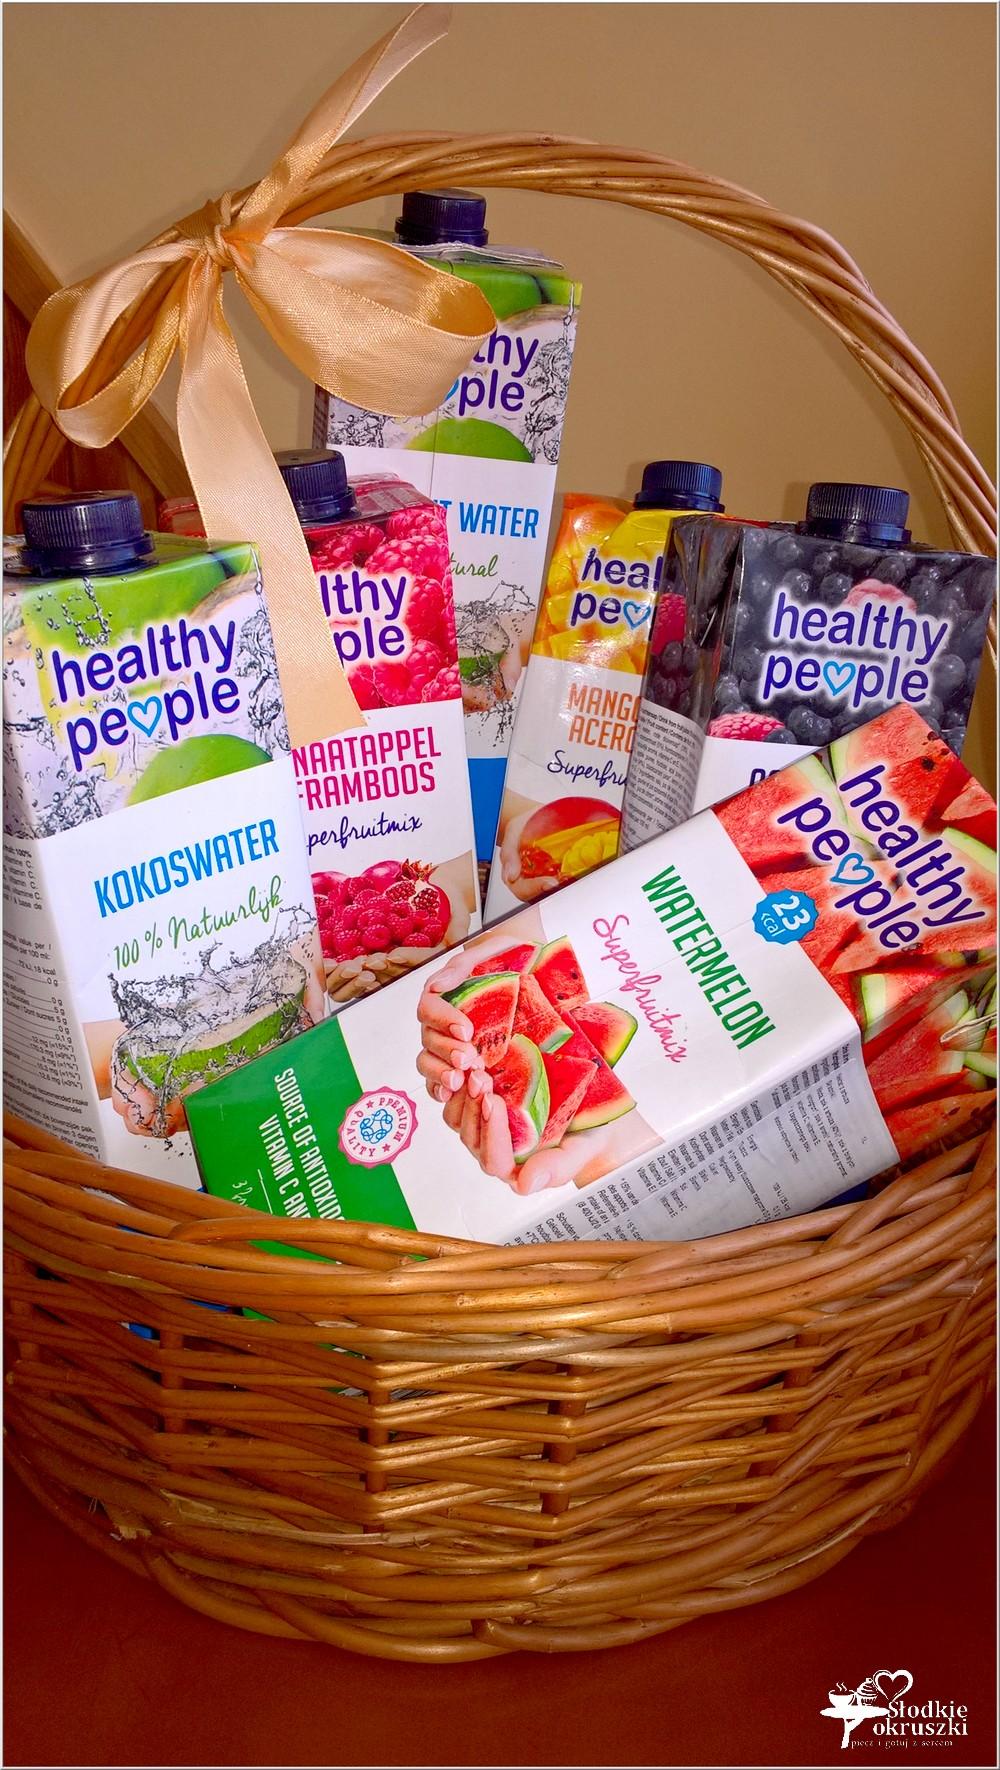 Healthy People (1)